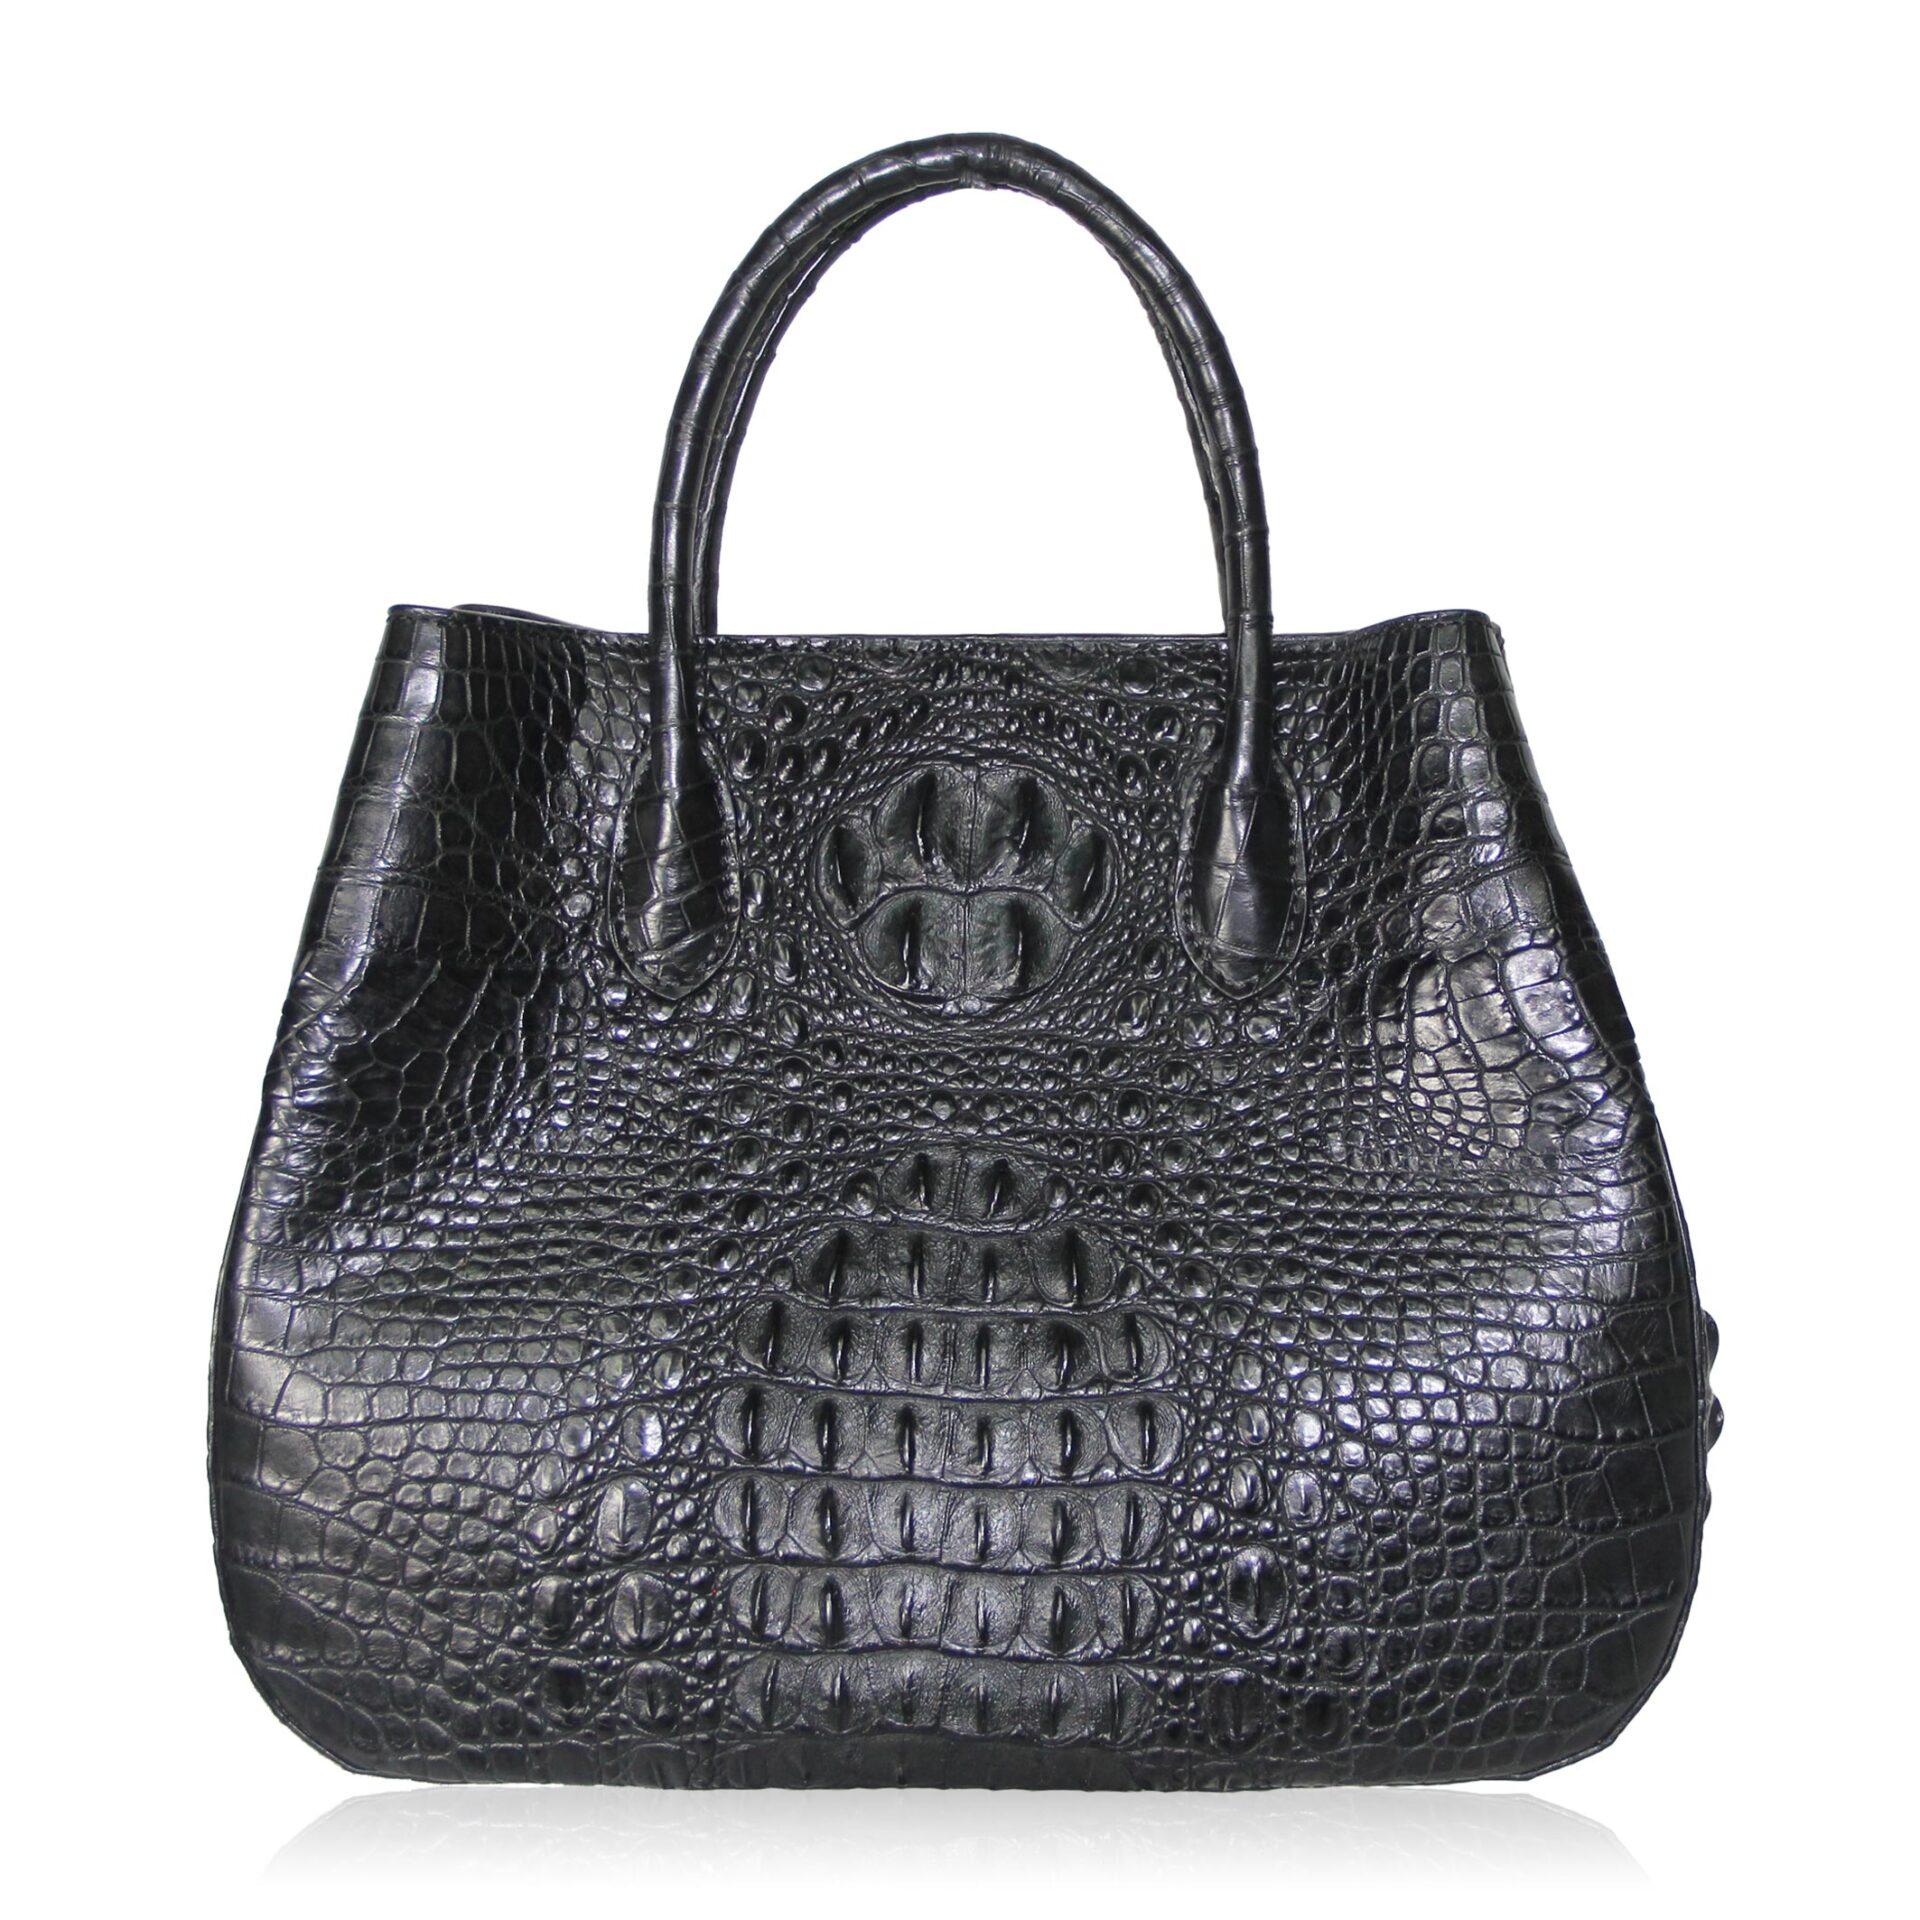 Women's Black Crocodile Leather Handbag Novel